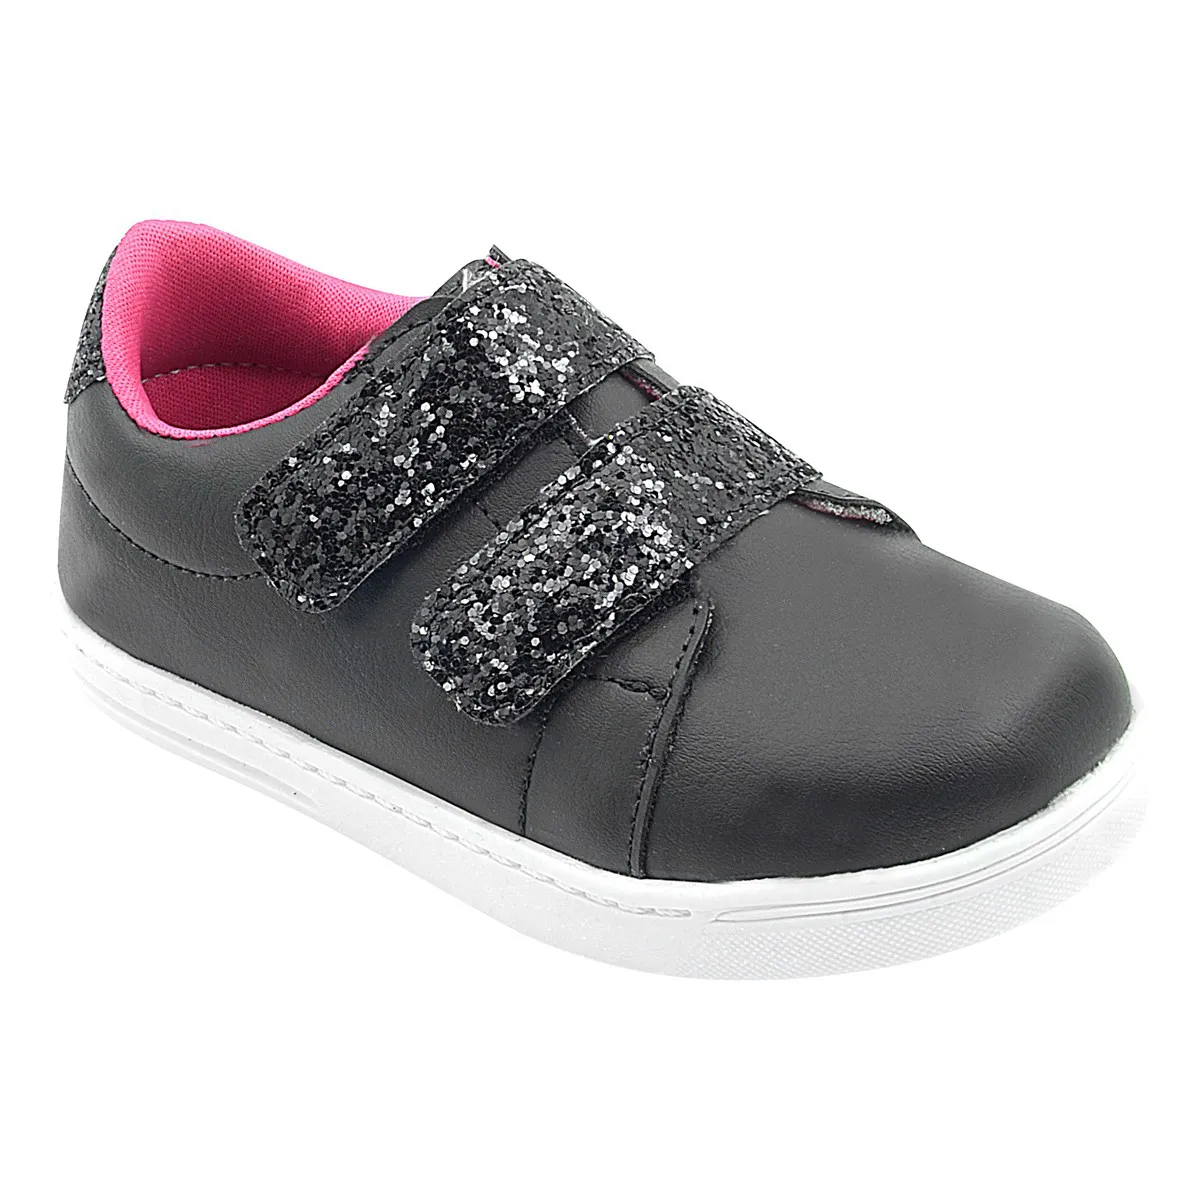 Tênis Infantil com Velcro Duplo Glitter Preto Feminino